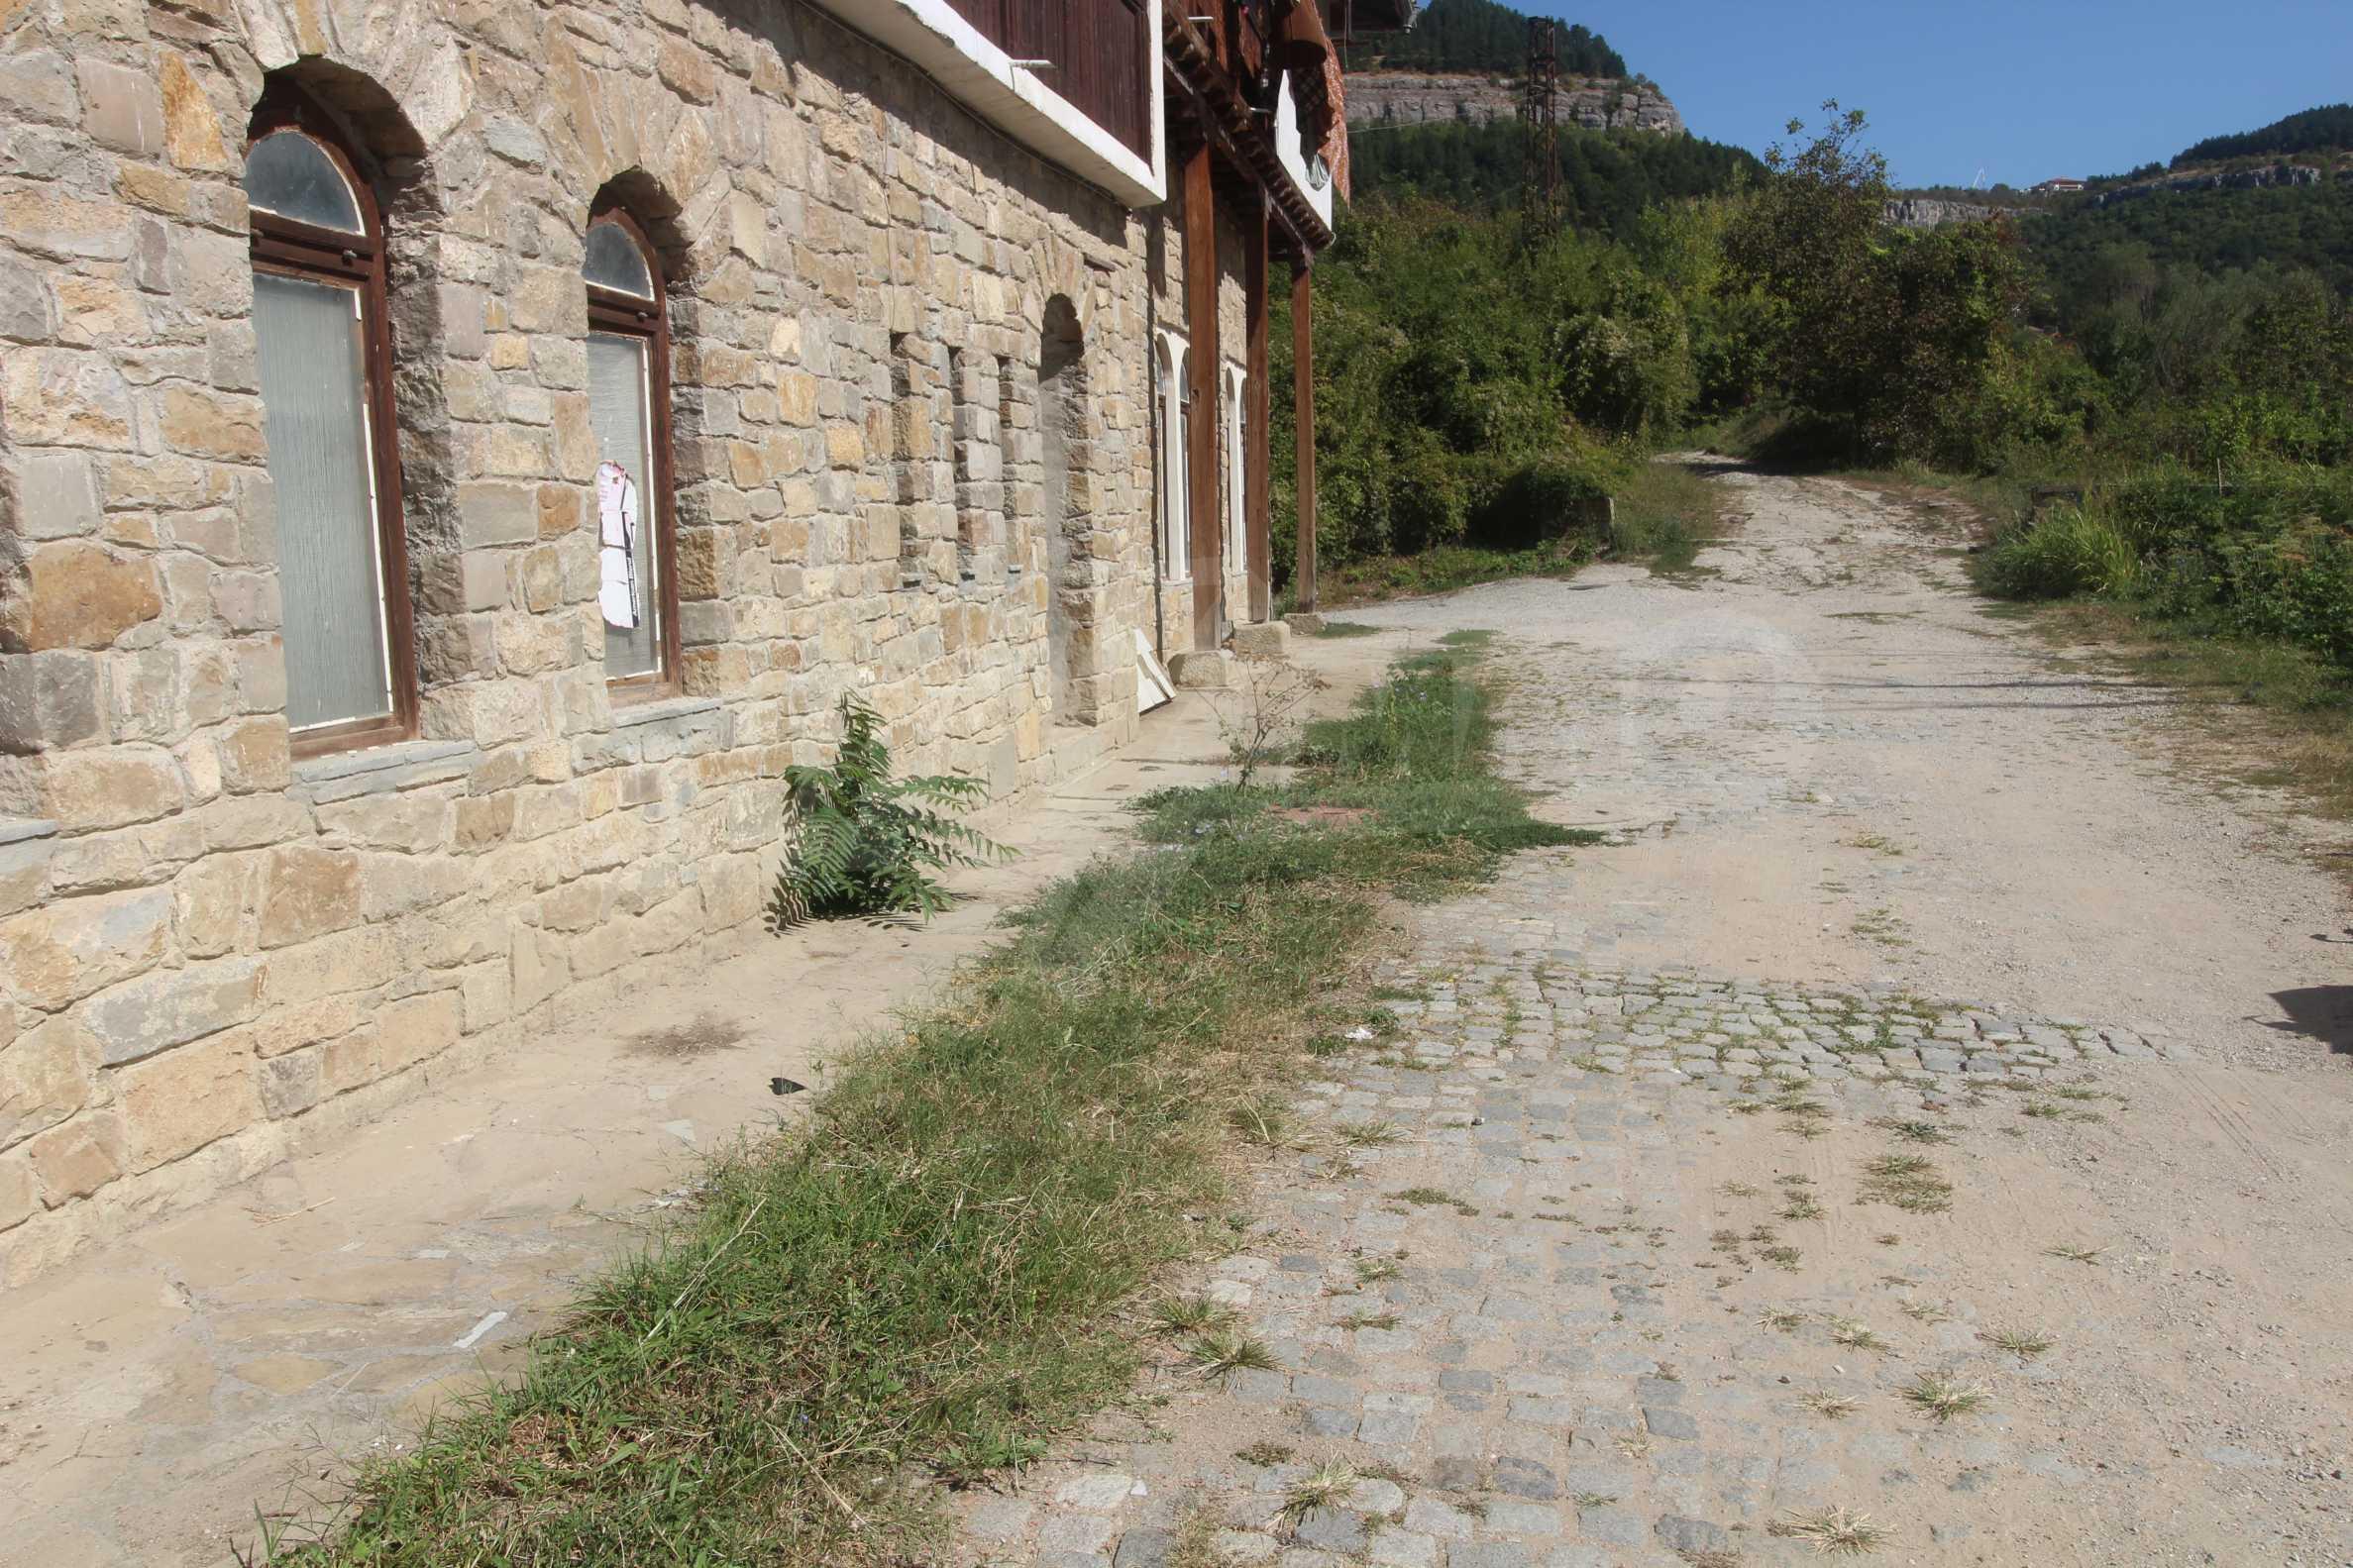 Restaurant am Fuße des Tsarevets-Hügels in Veliko Tarnovo 32